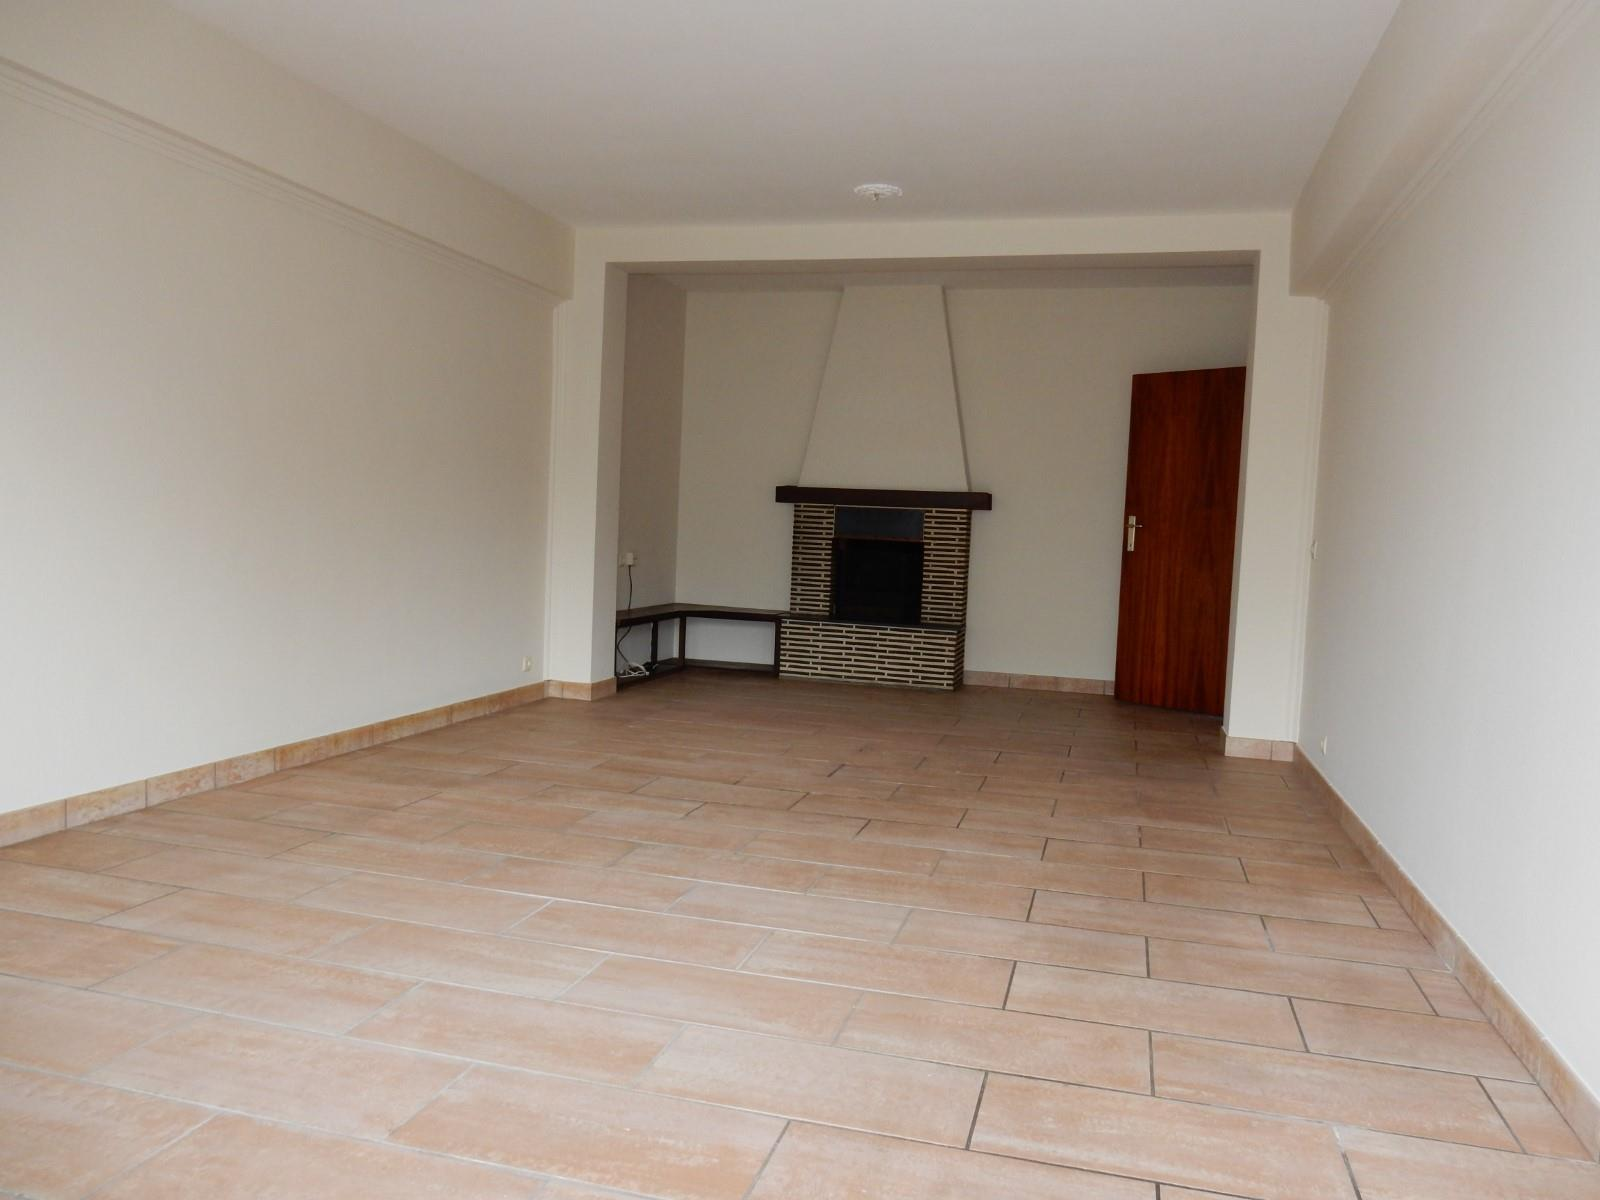 Appartement - Ganshoren - #2905682-2